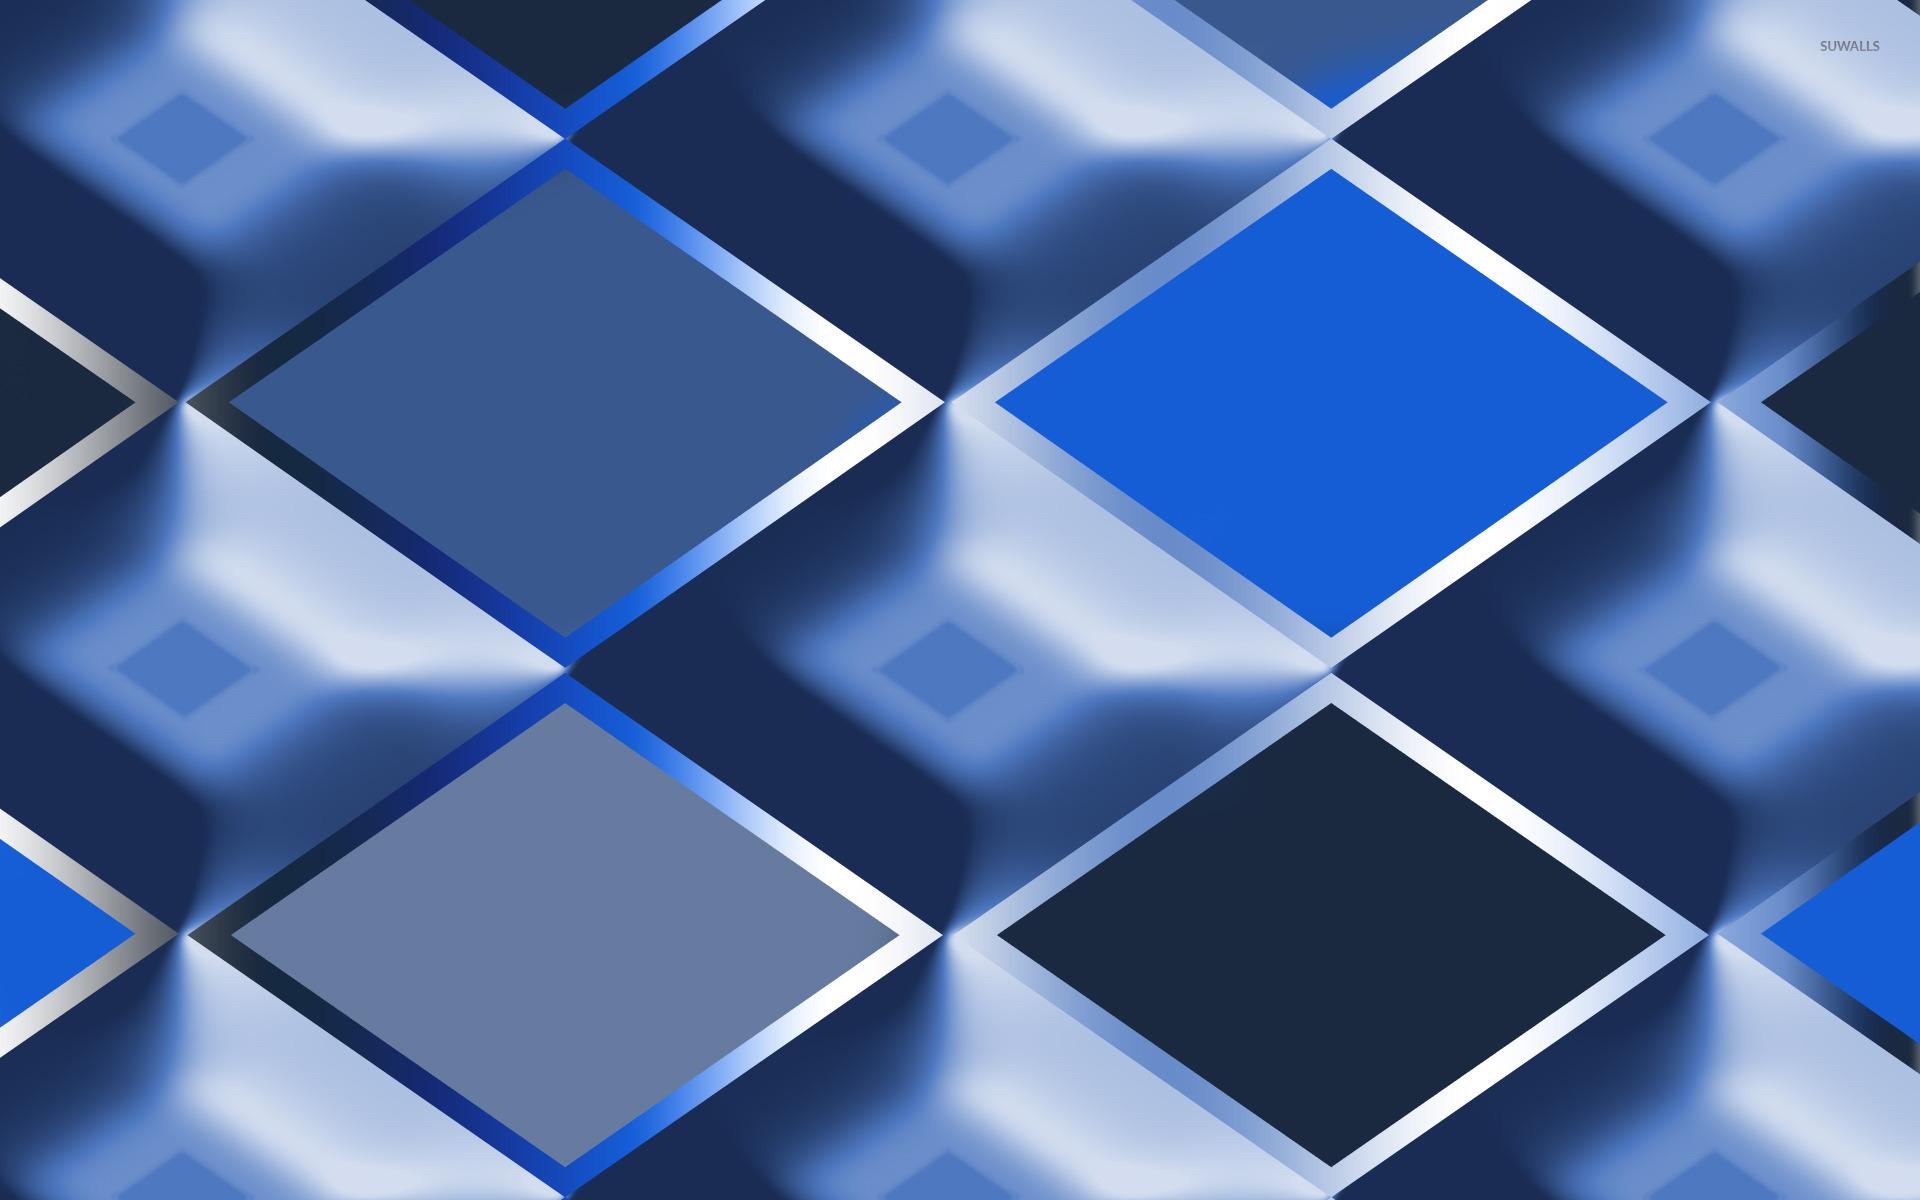 Blue Diamonds Wallpaper Abstract Wallpapers 20094